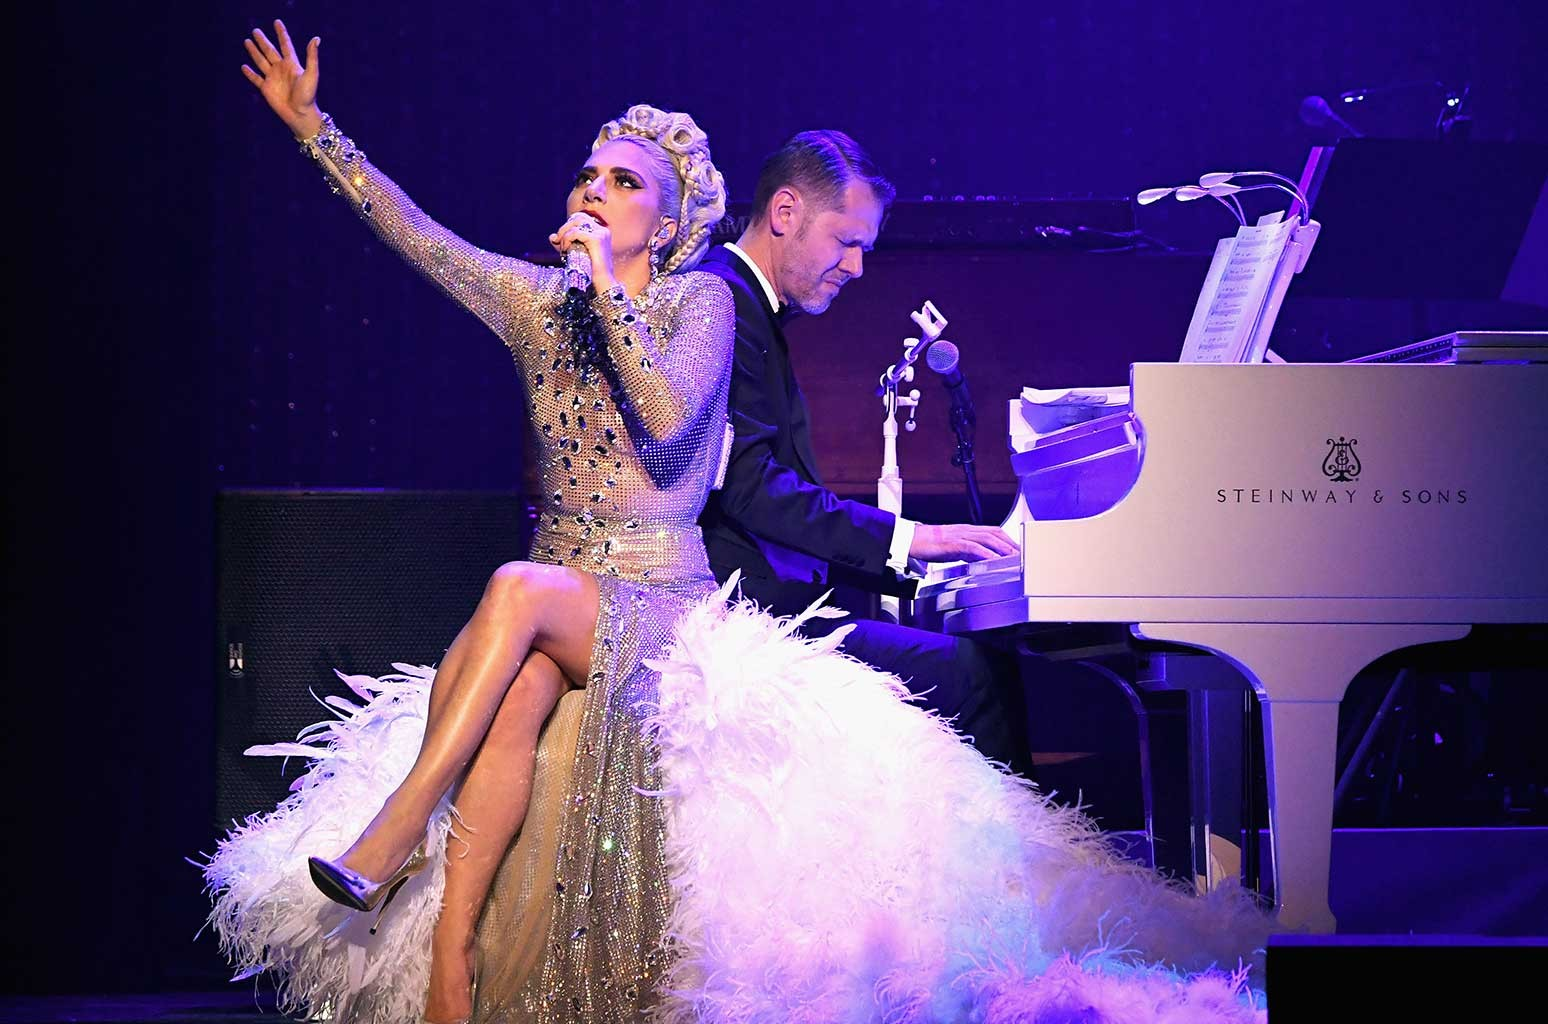 lady-gaga-jazz-and-piano-show-2019-b-bil